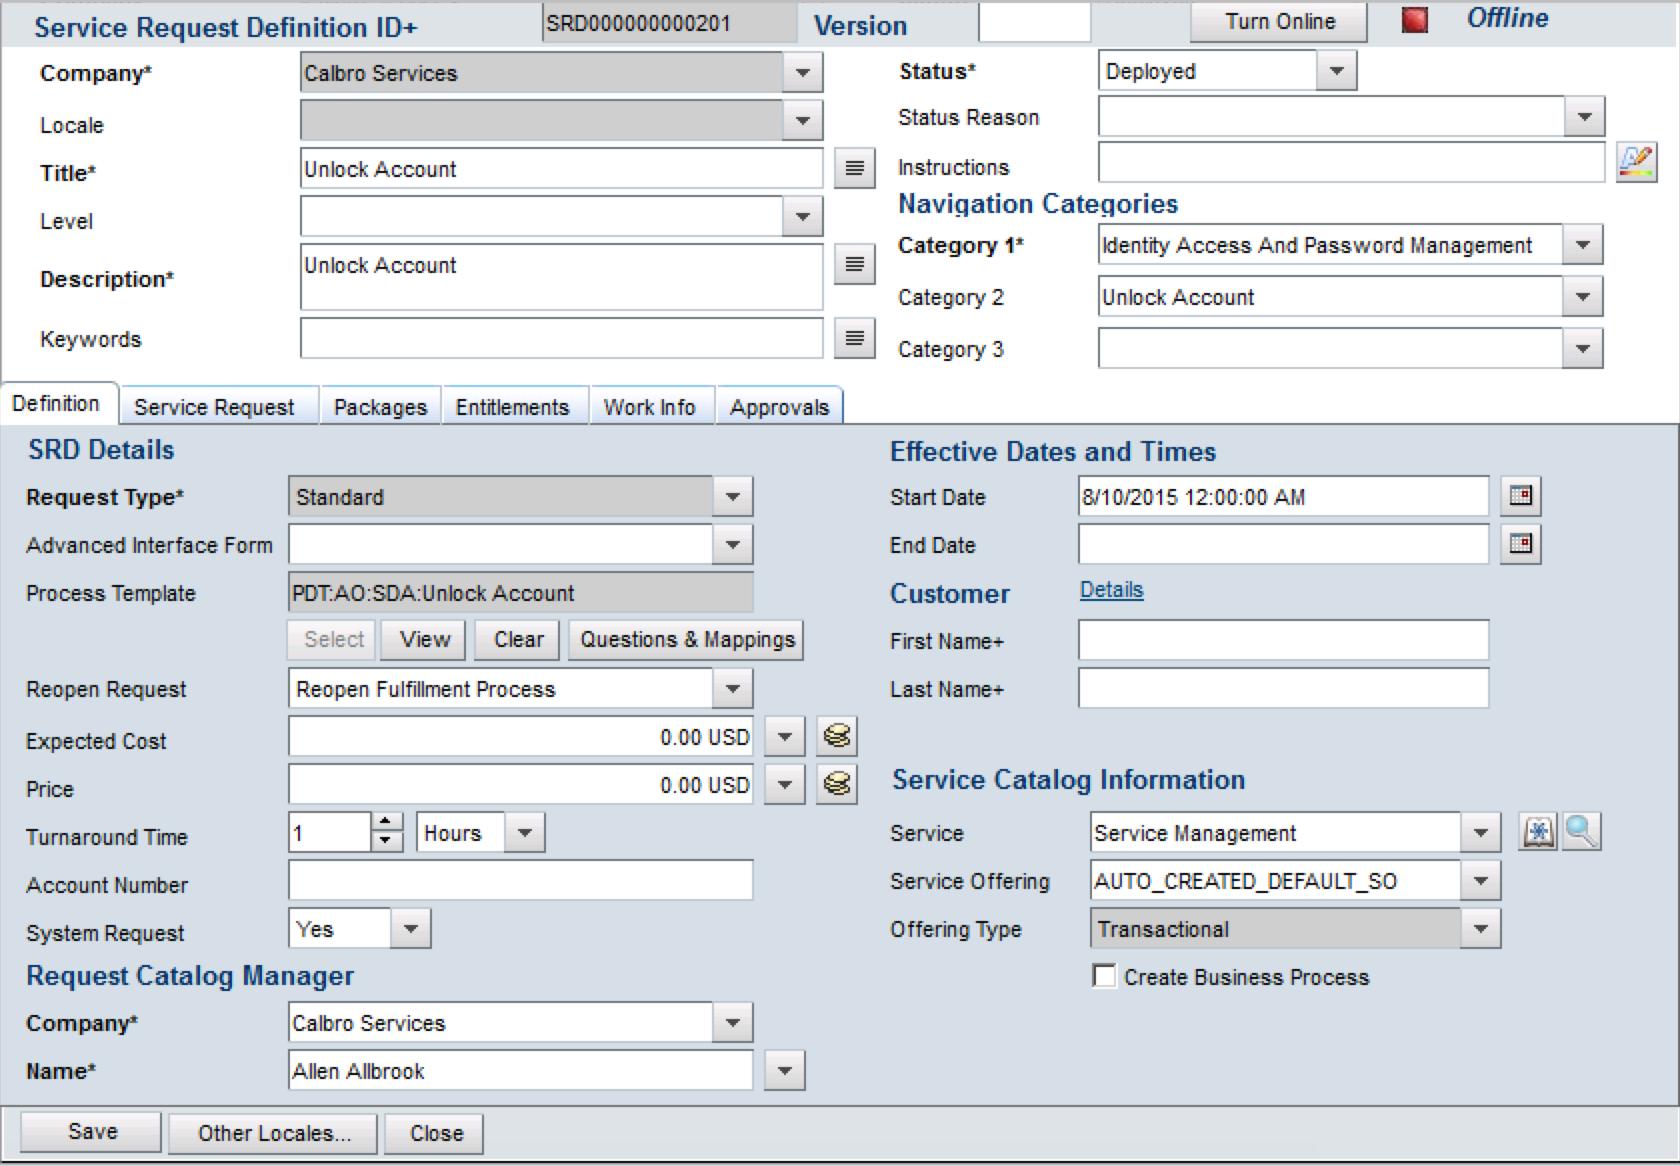 Creating a service request definition in BMC Service Request